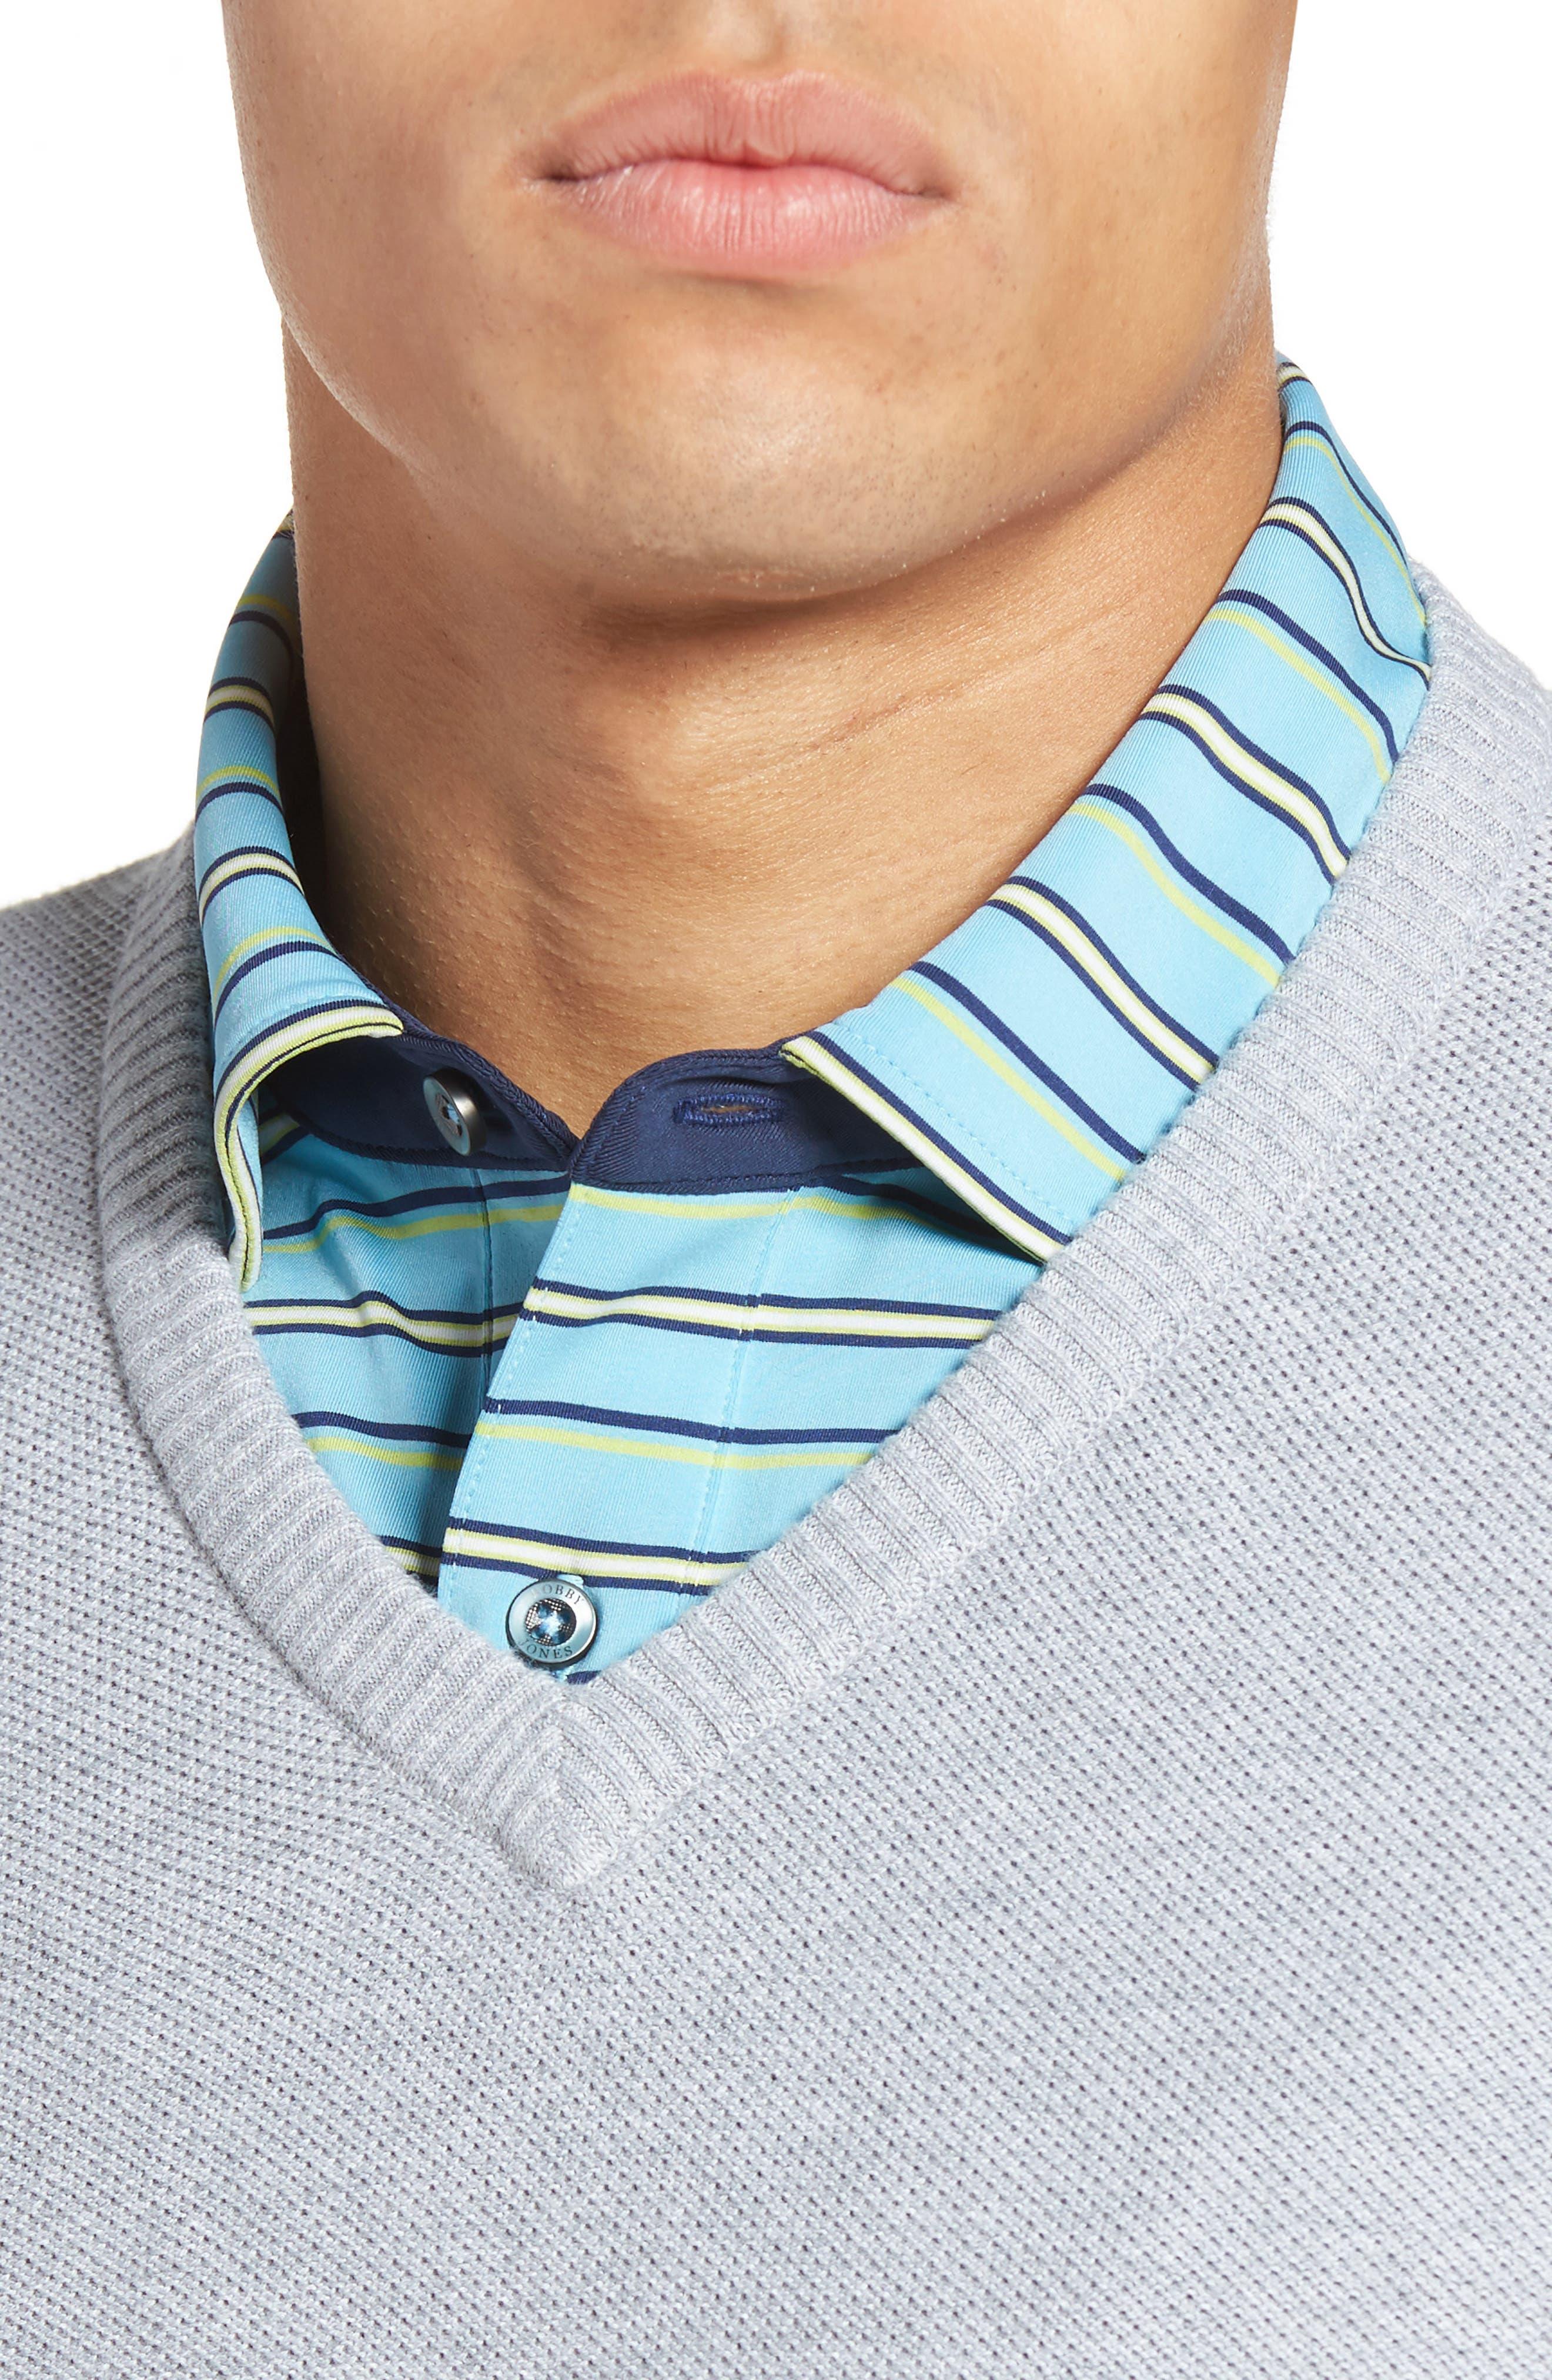 Piqué Jersey V-Neck Sweater,                             Alternate thumbnail 4, color,                             078